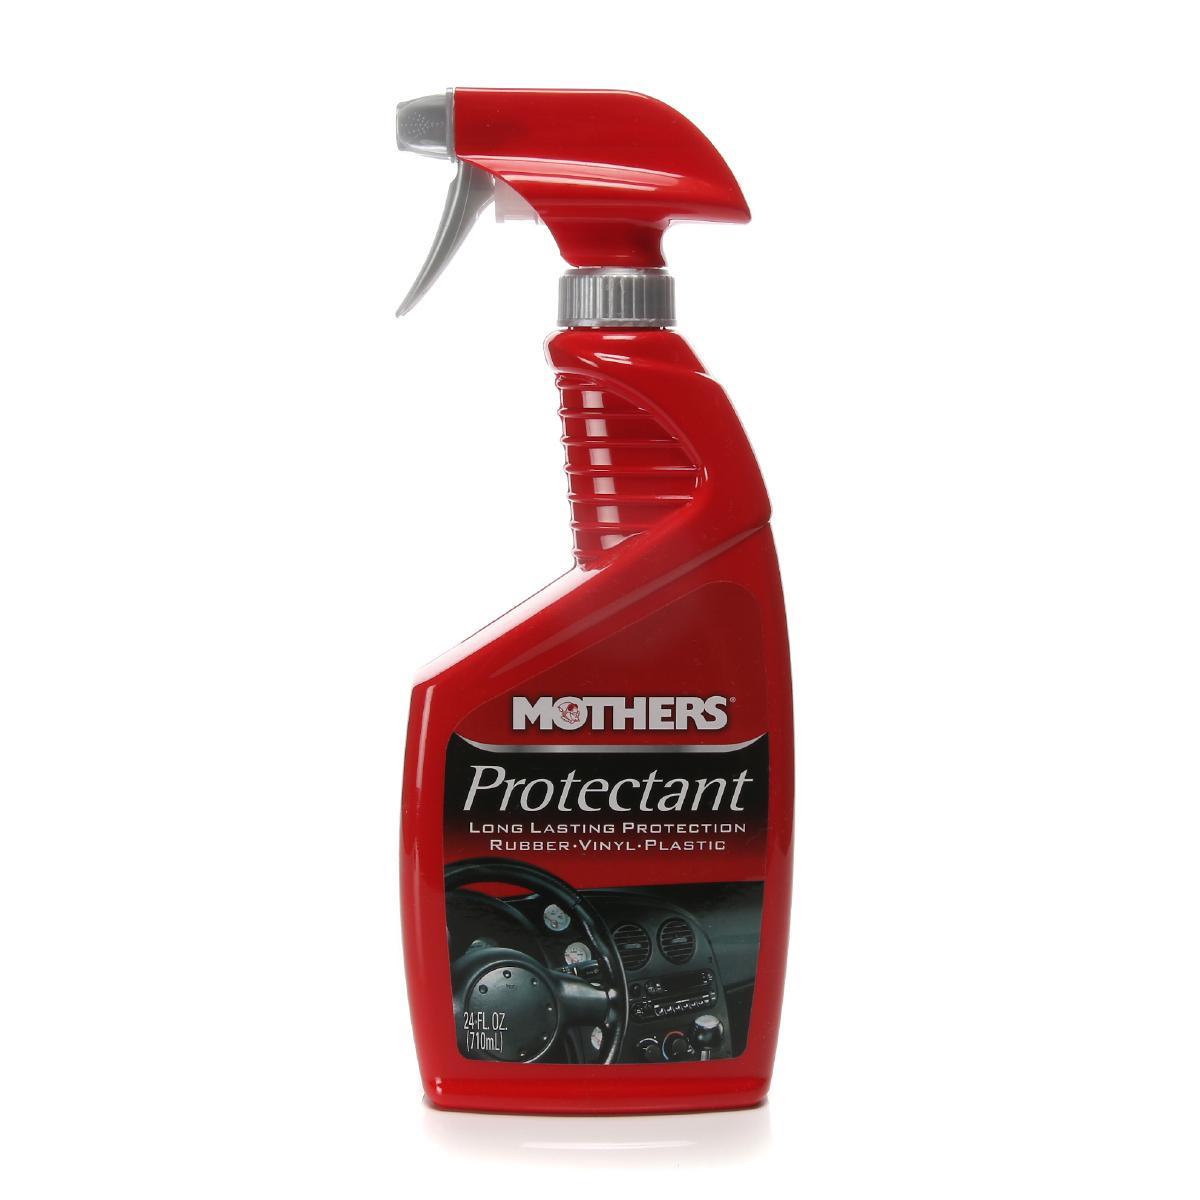 Plastbehandling Mothers Protectant, 700 ml